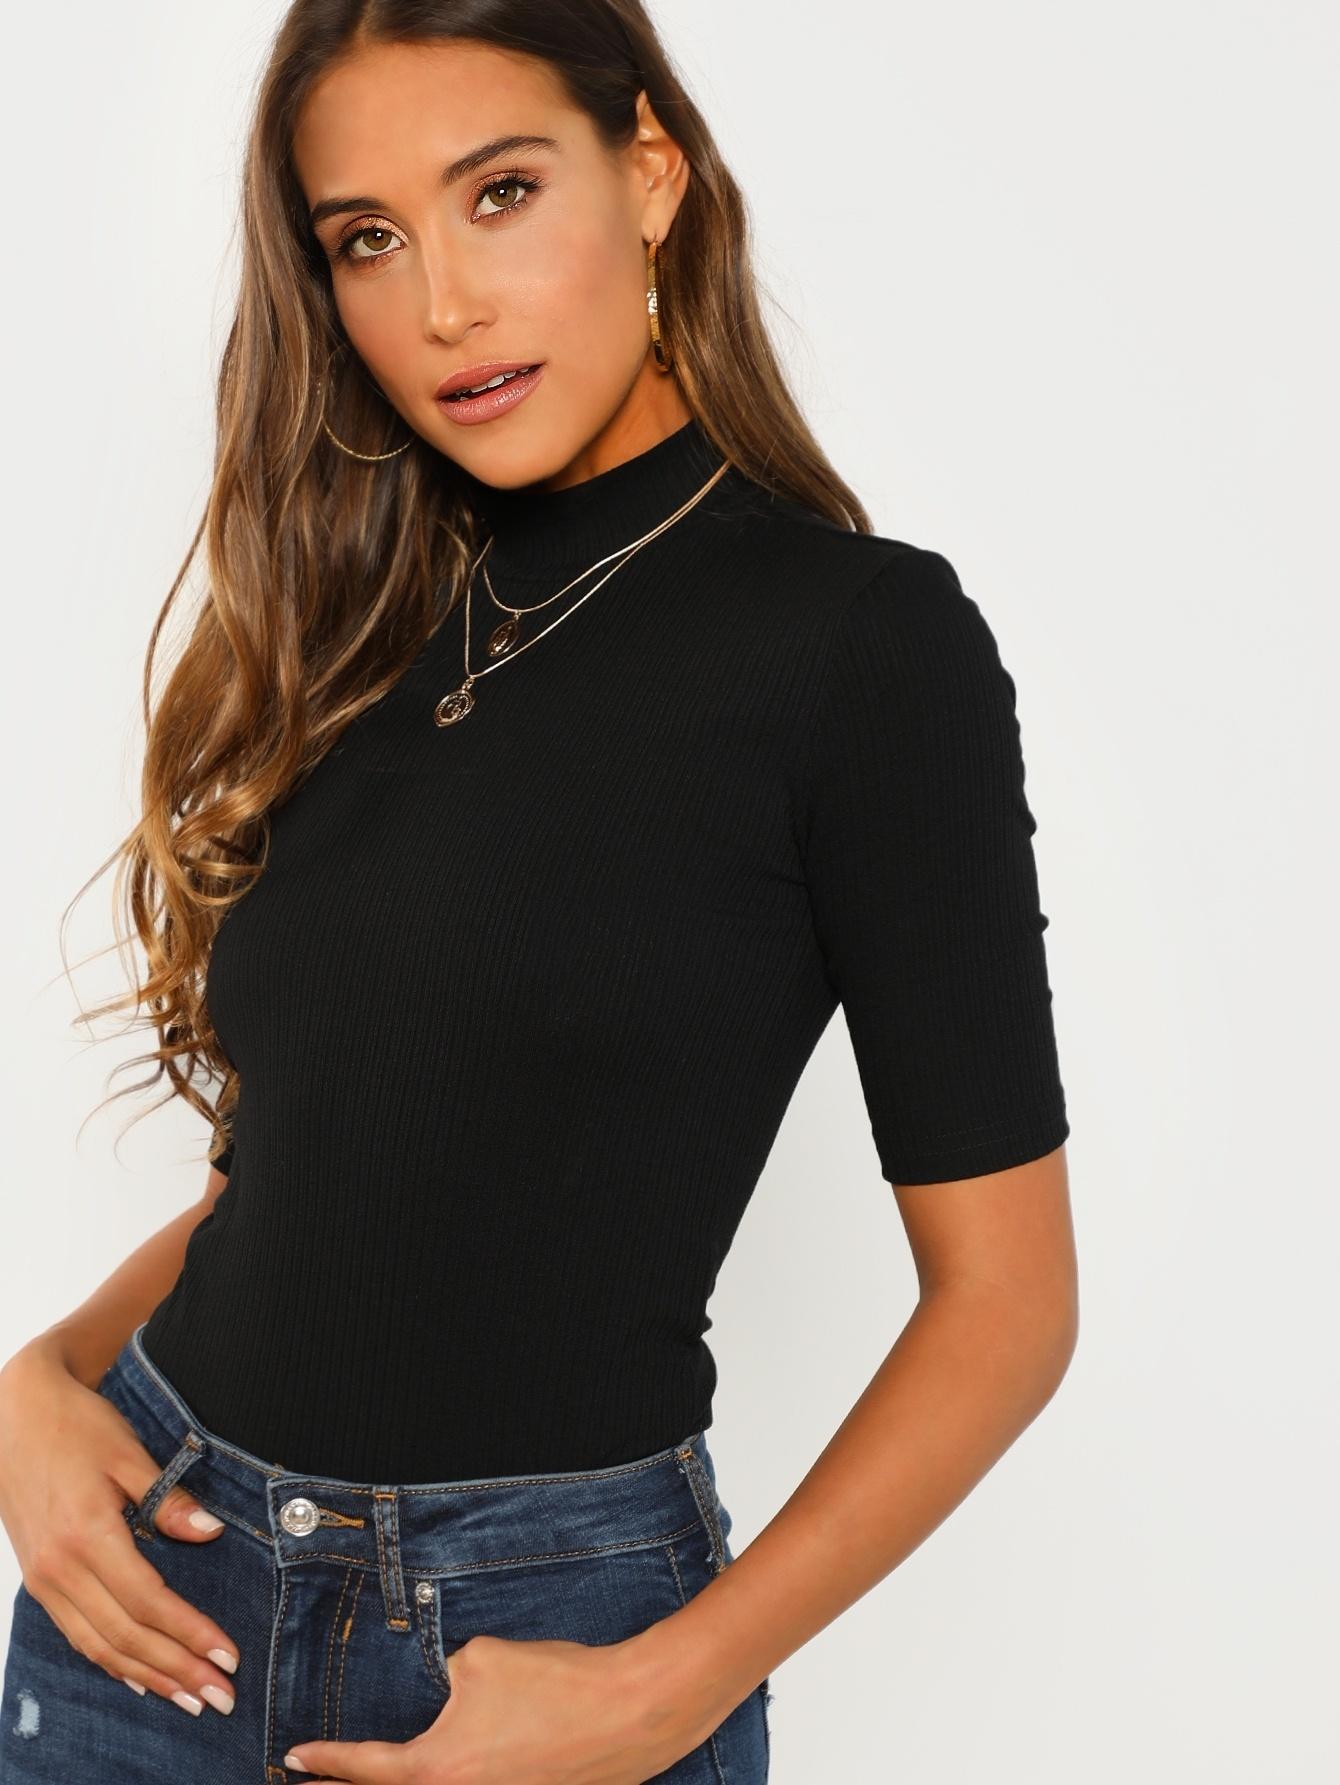 Купить Приталенная футболка со стоячим воротником, Anna Herrin, SheIn